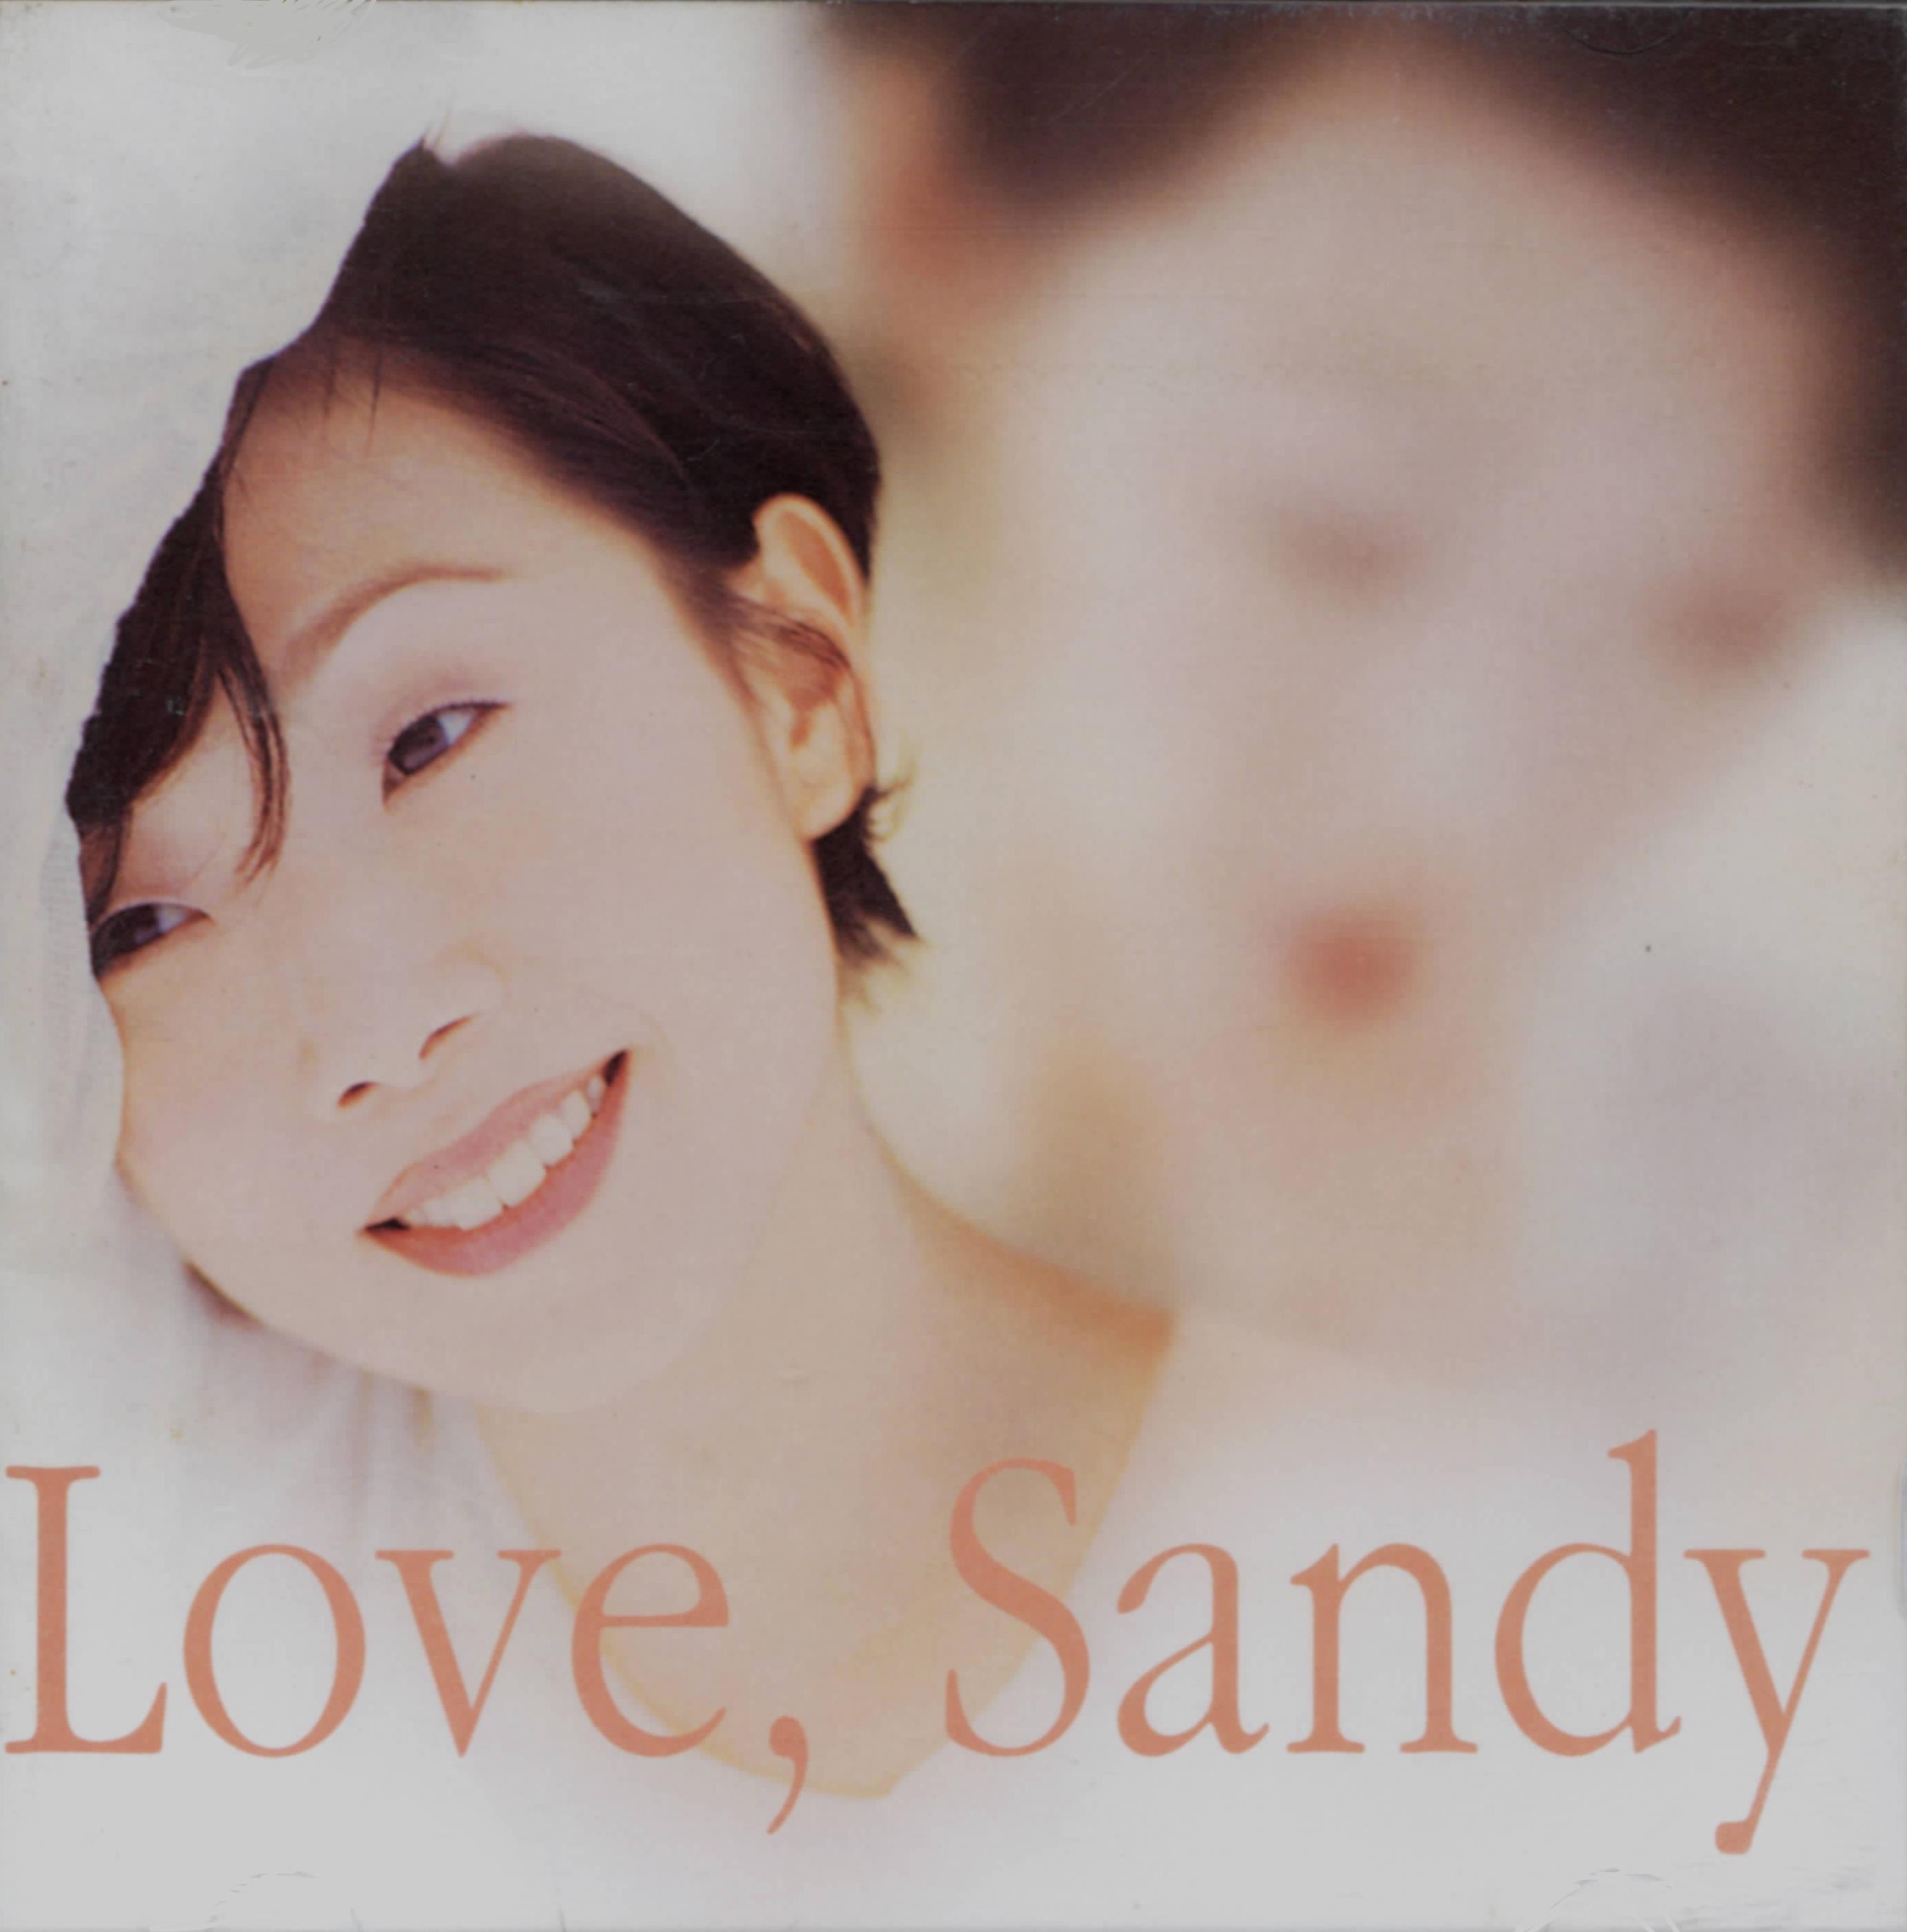 林忆莲 Love Sandy